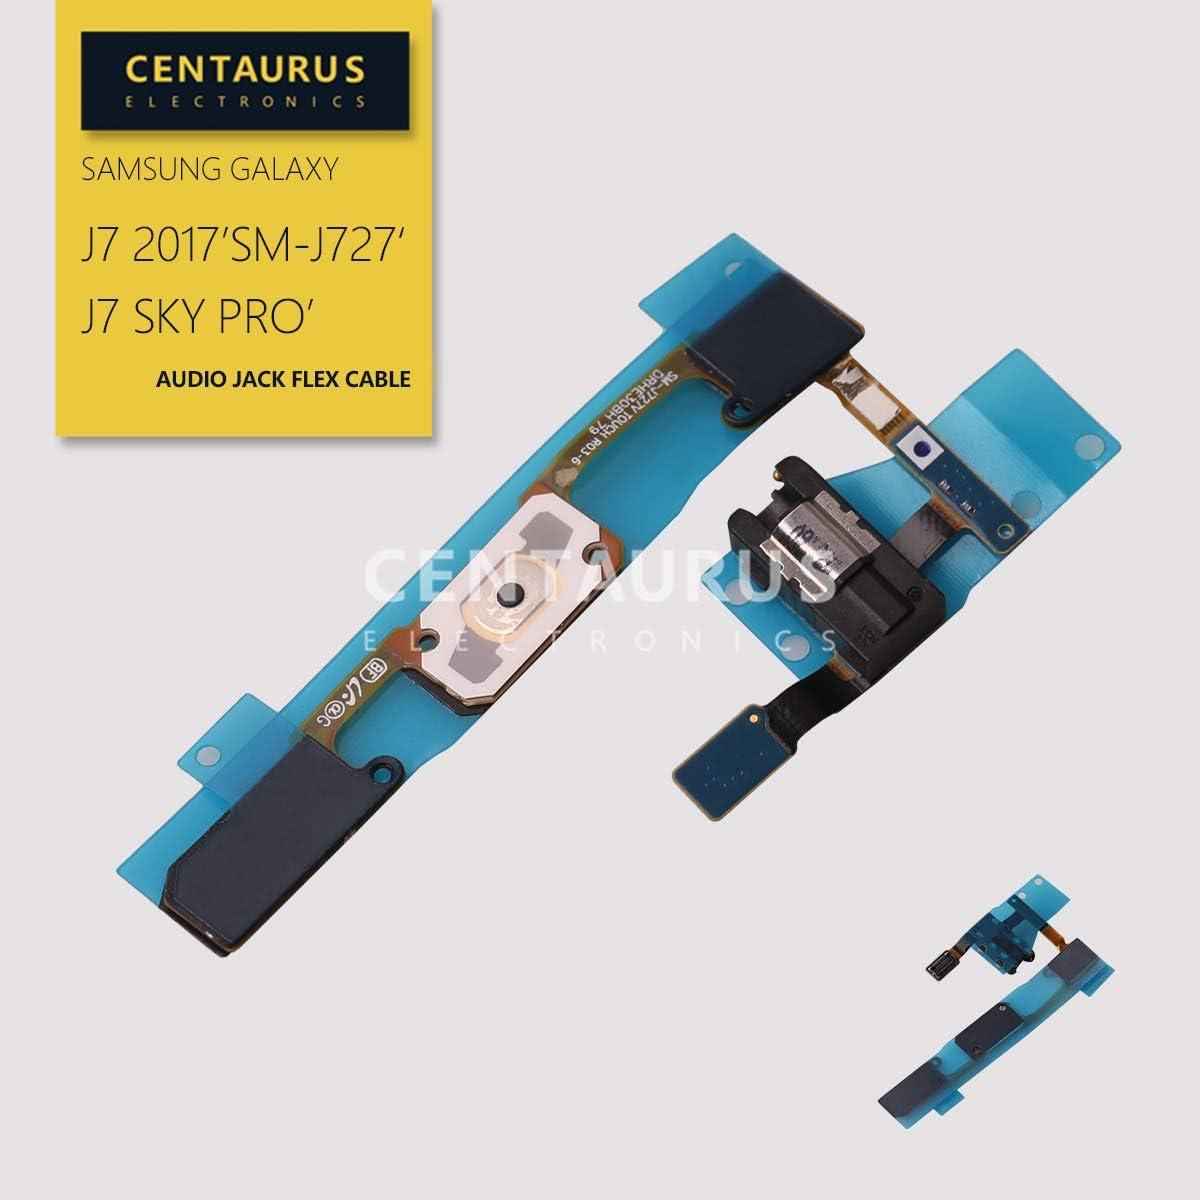 CENTAURUS Replacement for Samsung J727 Home Button Keypad Key Sensor Button Headphone Audio Jack Flex Cable fit Galaxy J7 2017 Prime J727 J727V J727T J727T1 J727A J727P Sky Pro S727VL S737TL